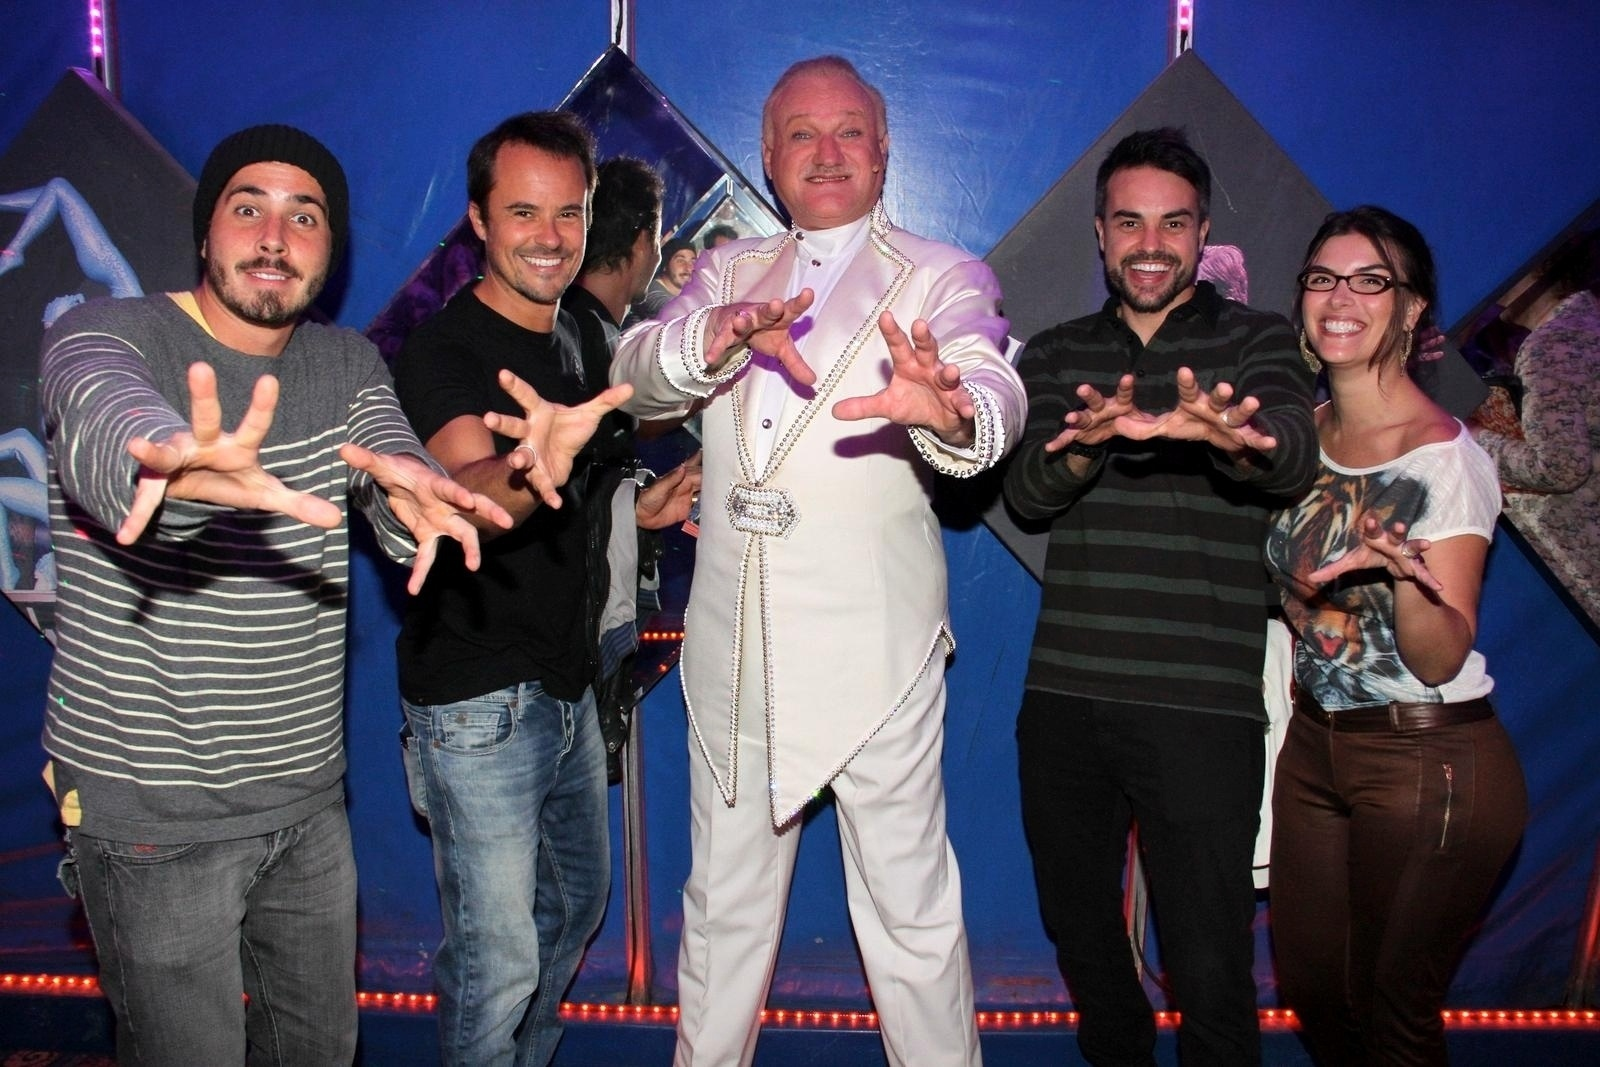 18.set.2013 - Paulo Vilhena, Marcio Kieling e amigos posam com o ilusionista Richard Massone do circo Tihany, na Barra da Tijuca, no Rio